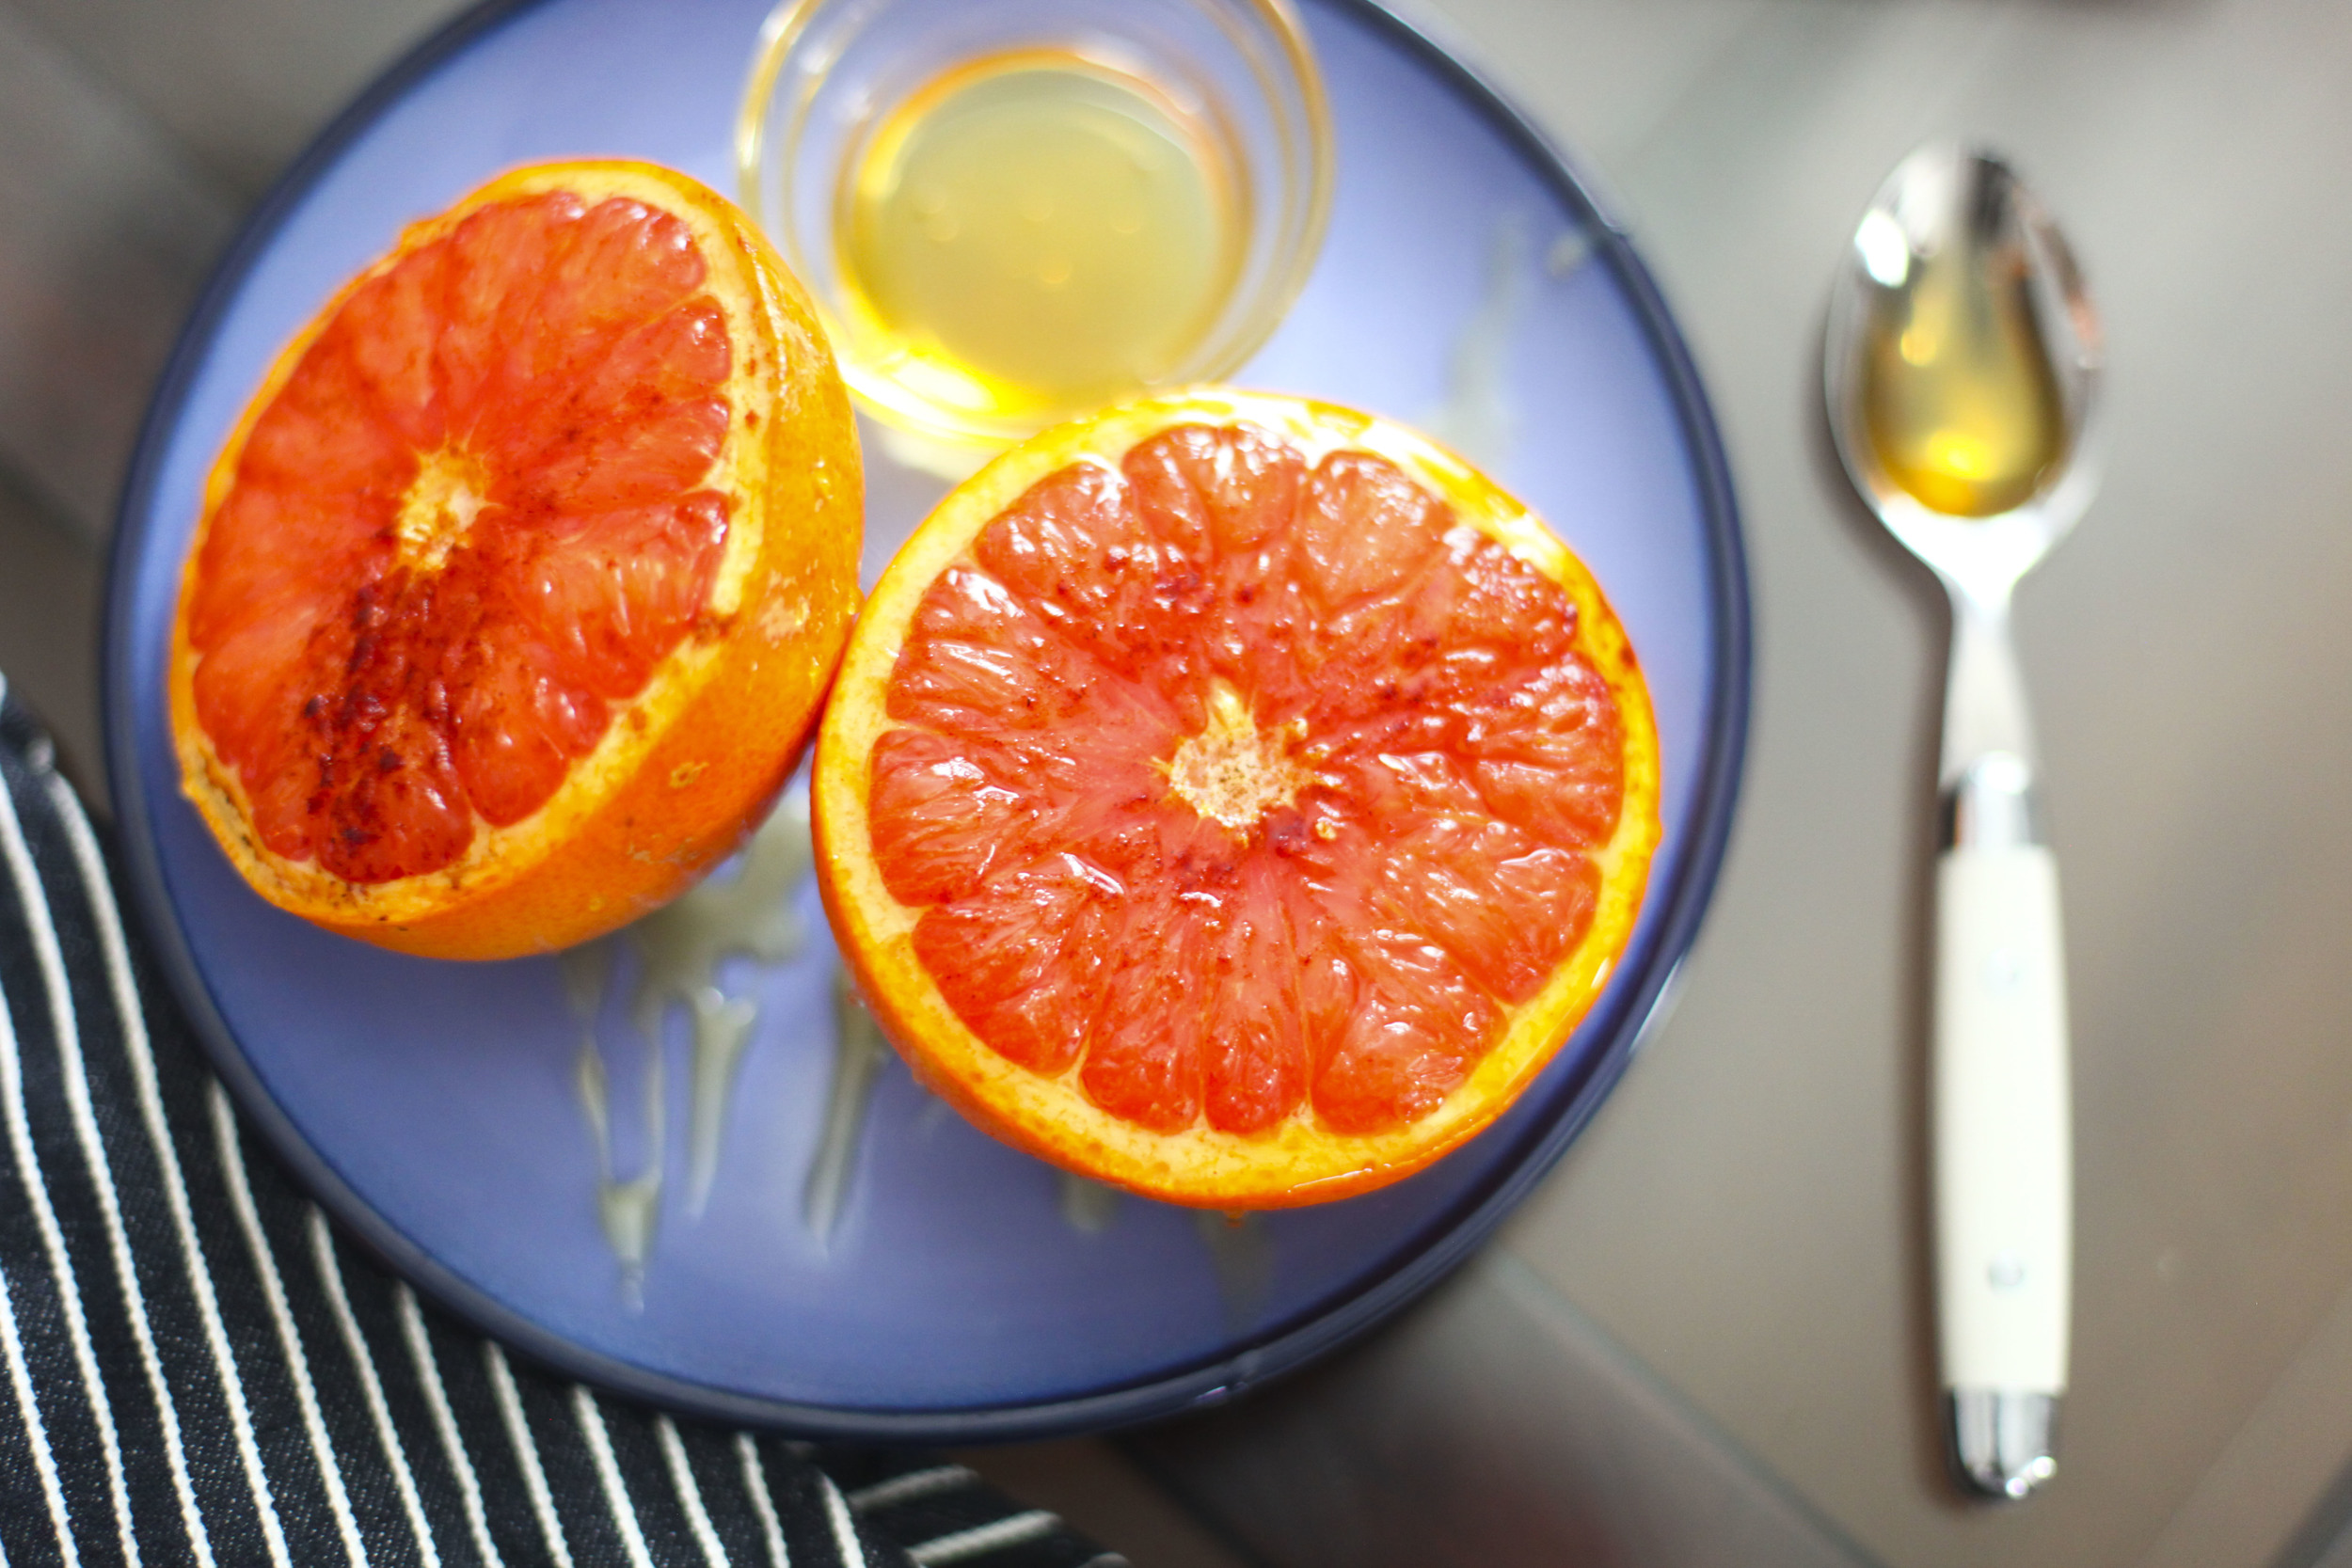 grapefruit2.JPG